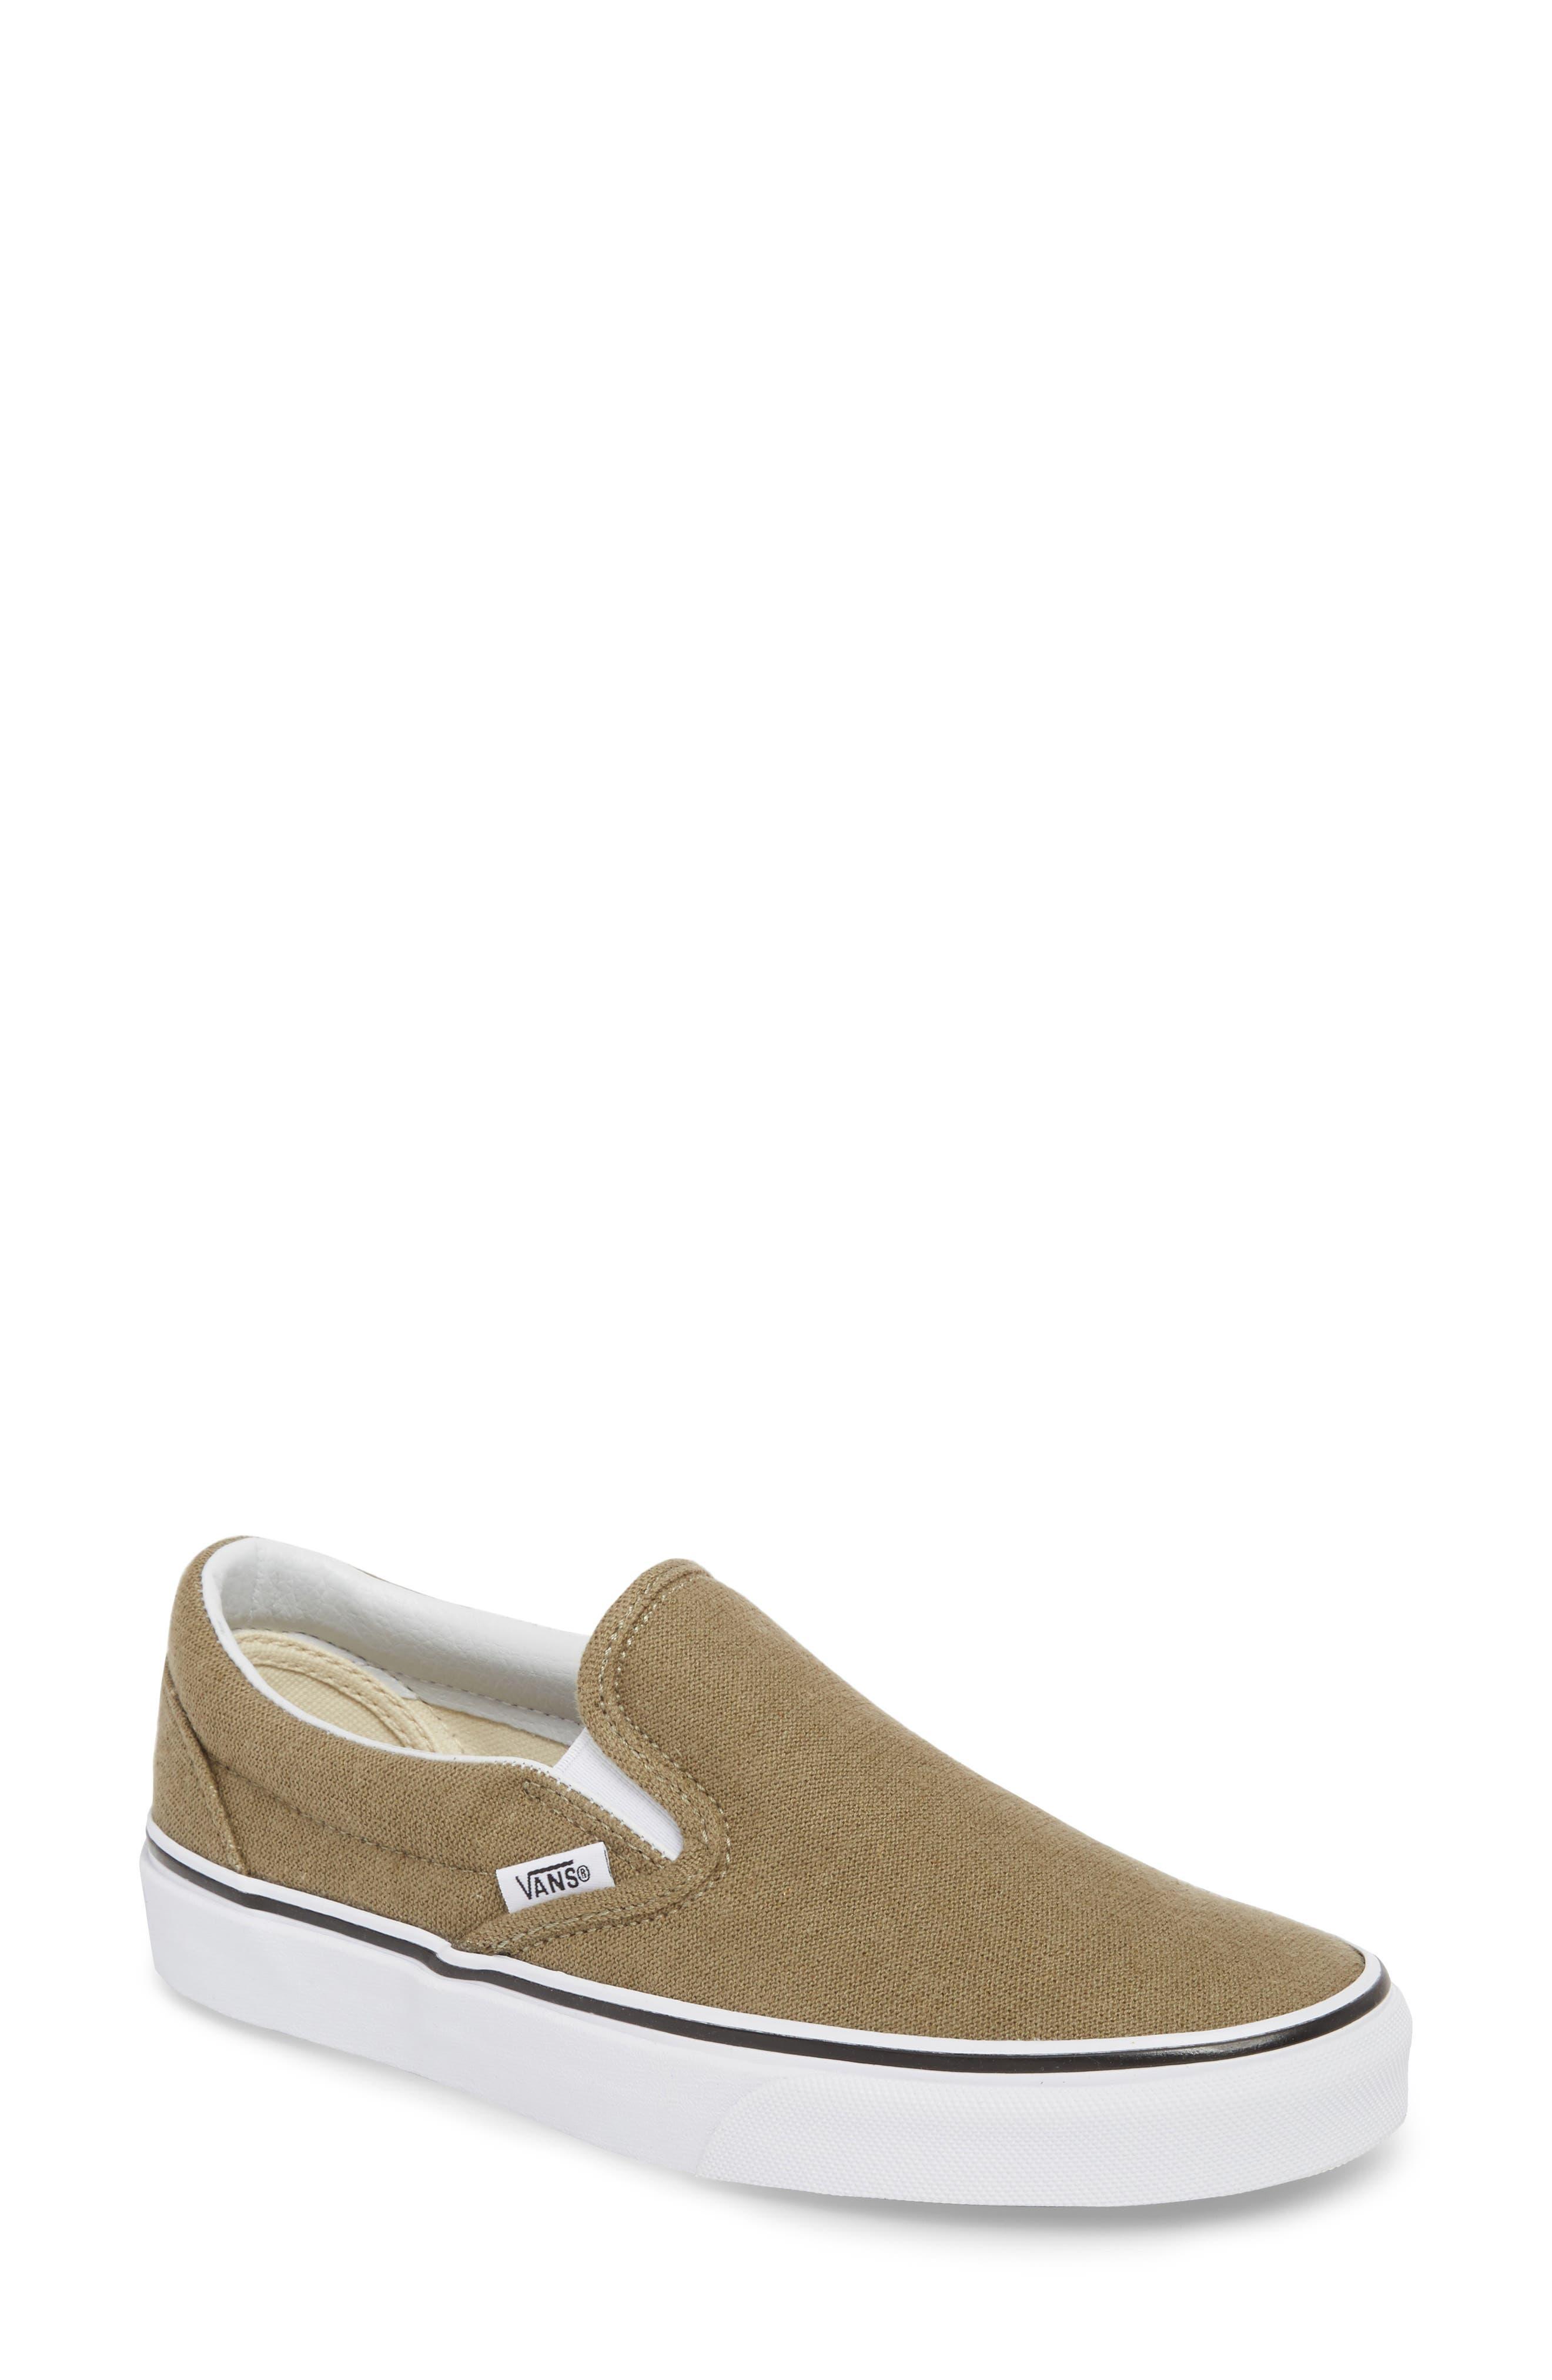 ,                             Classic Slip-On Sneaker,                             Main thumbnail 141, color,                             310